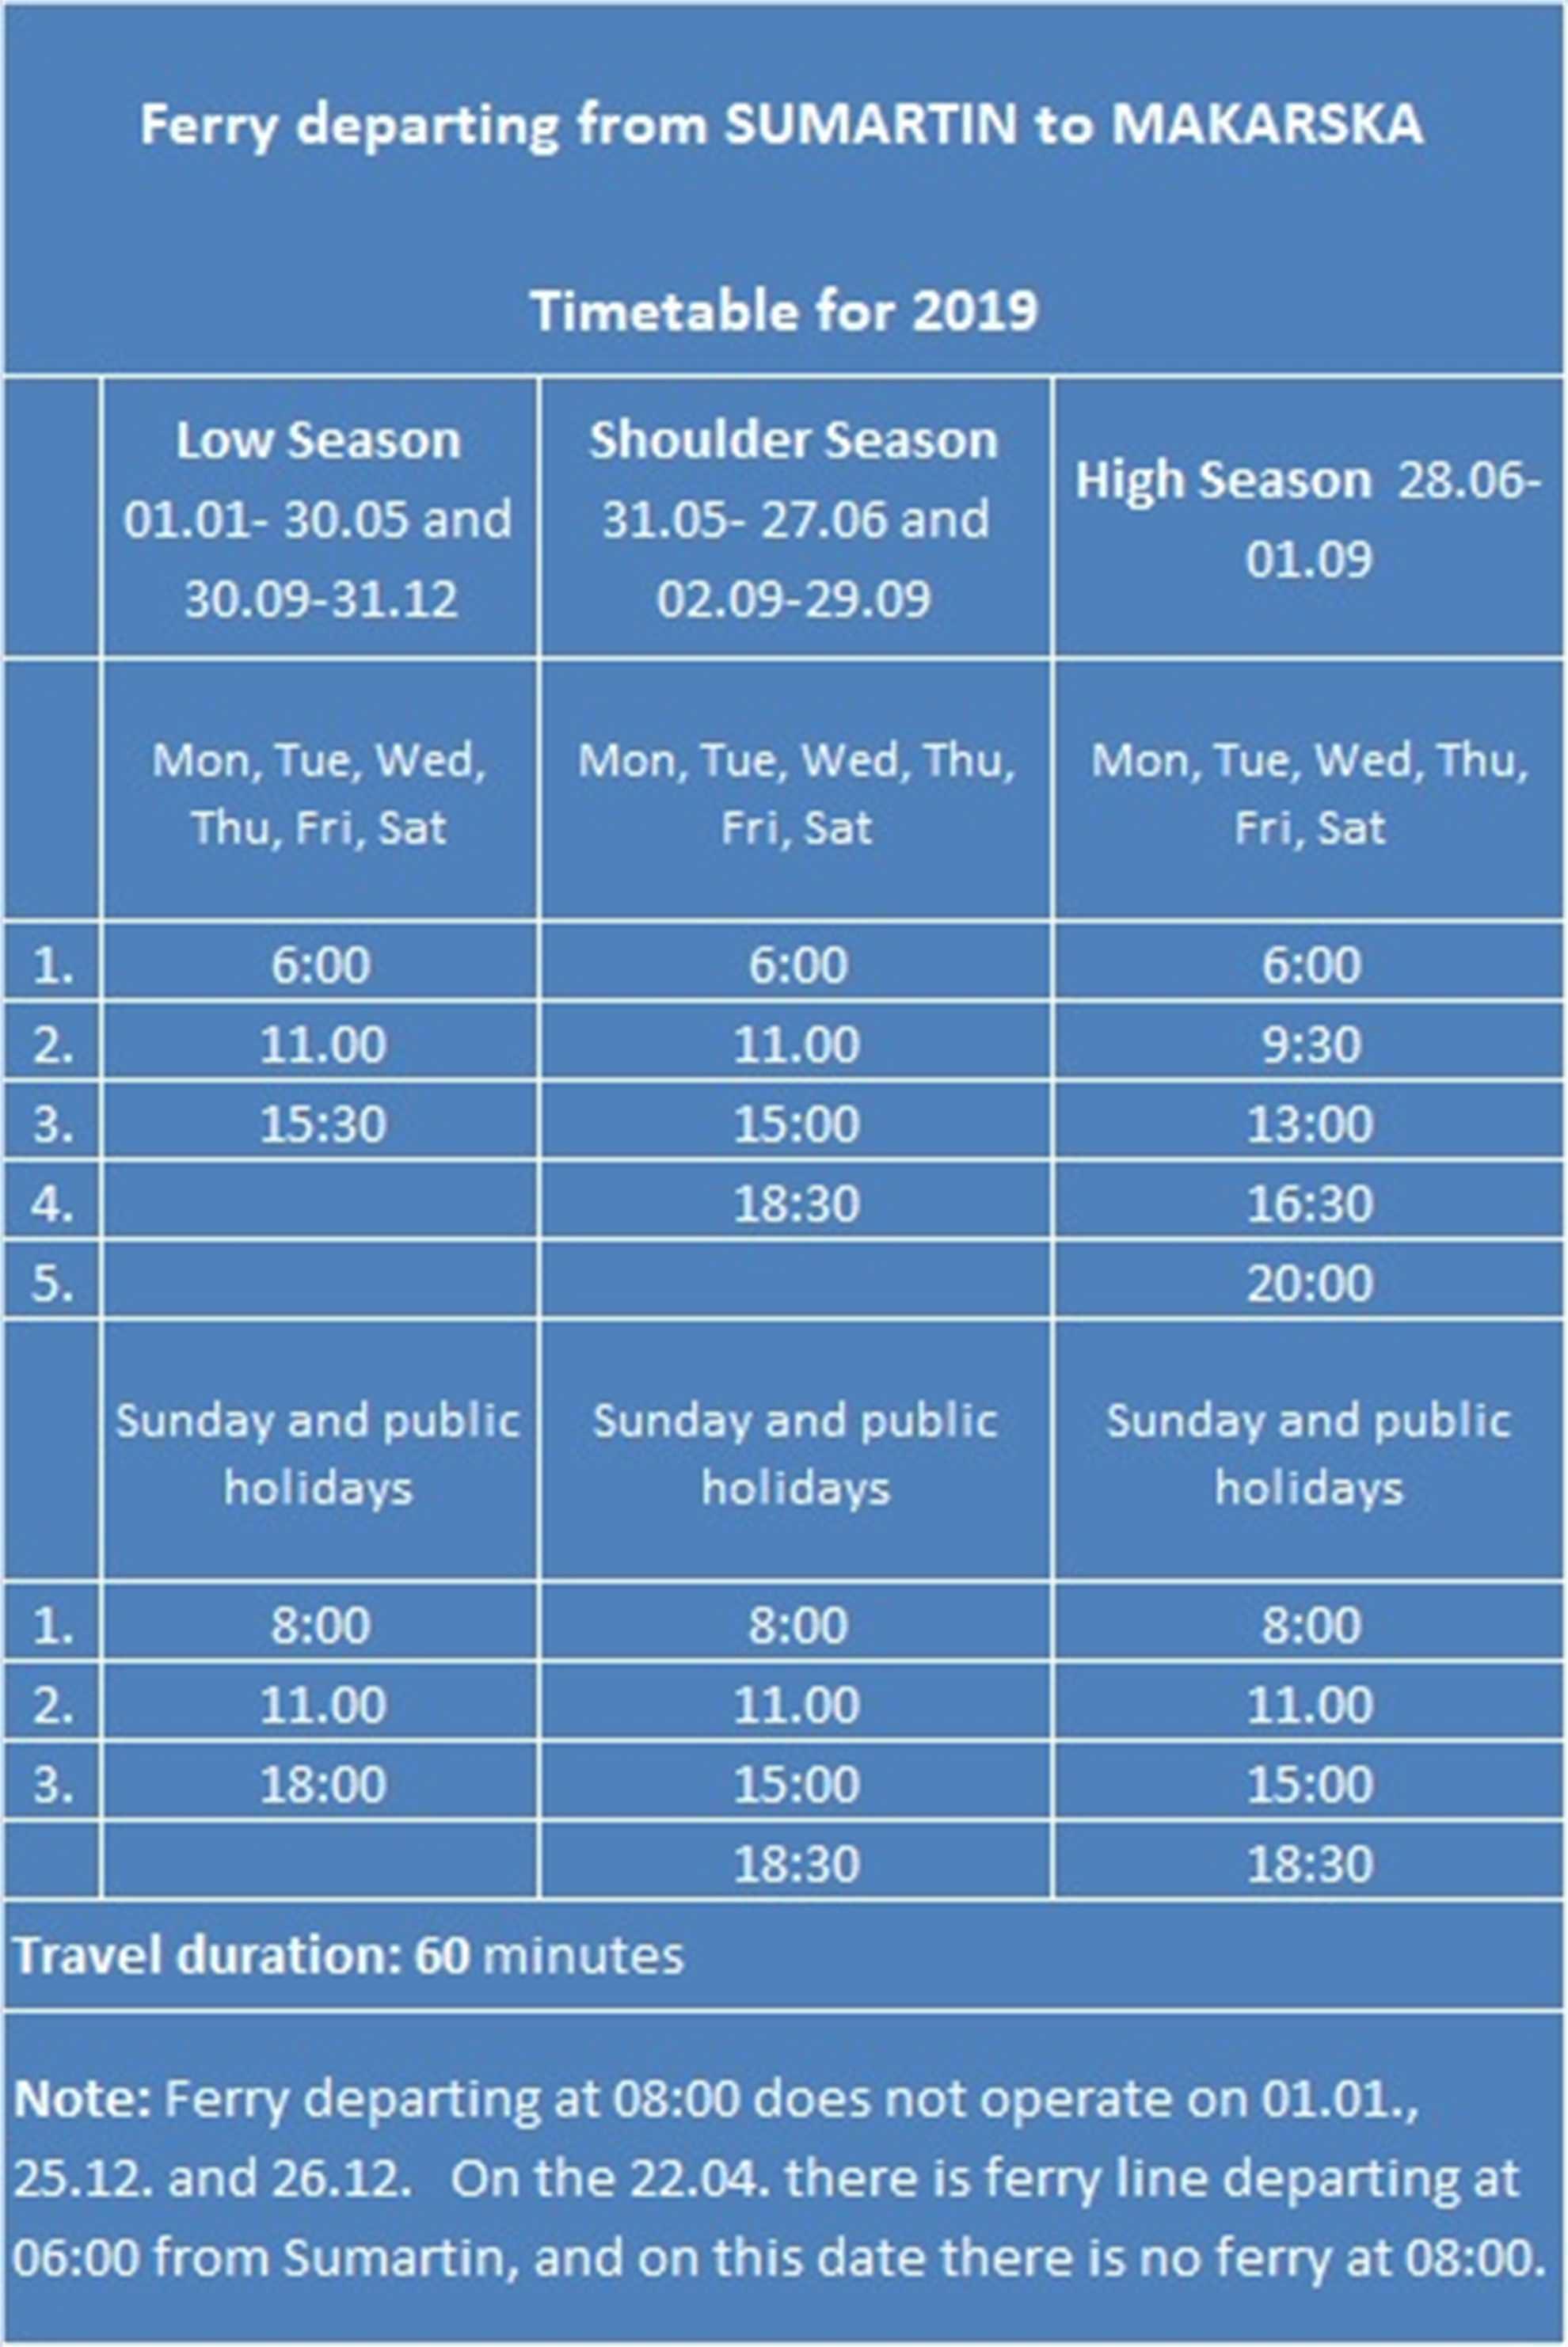 The Ferry Timetable 2019 Sumartin (Brac) to Makarska